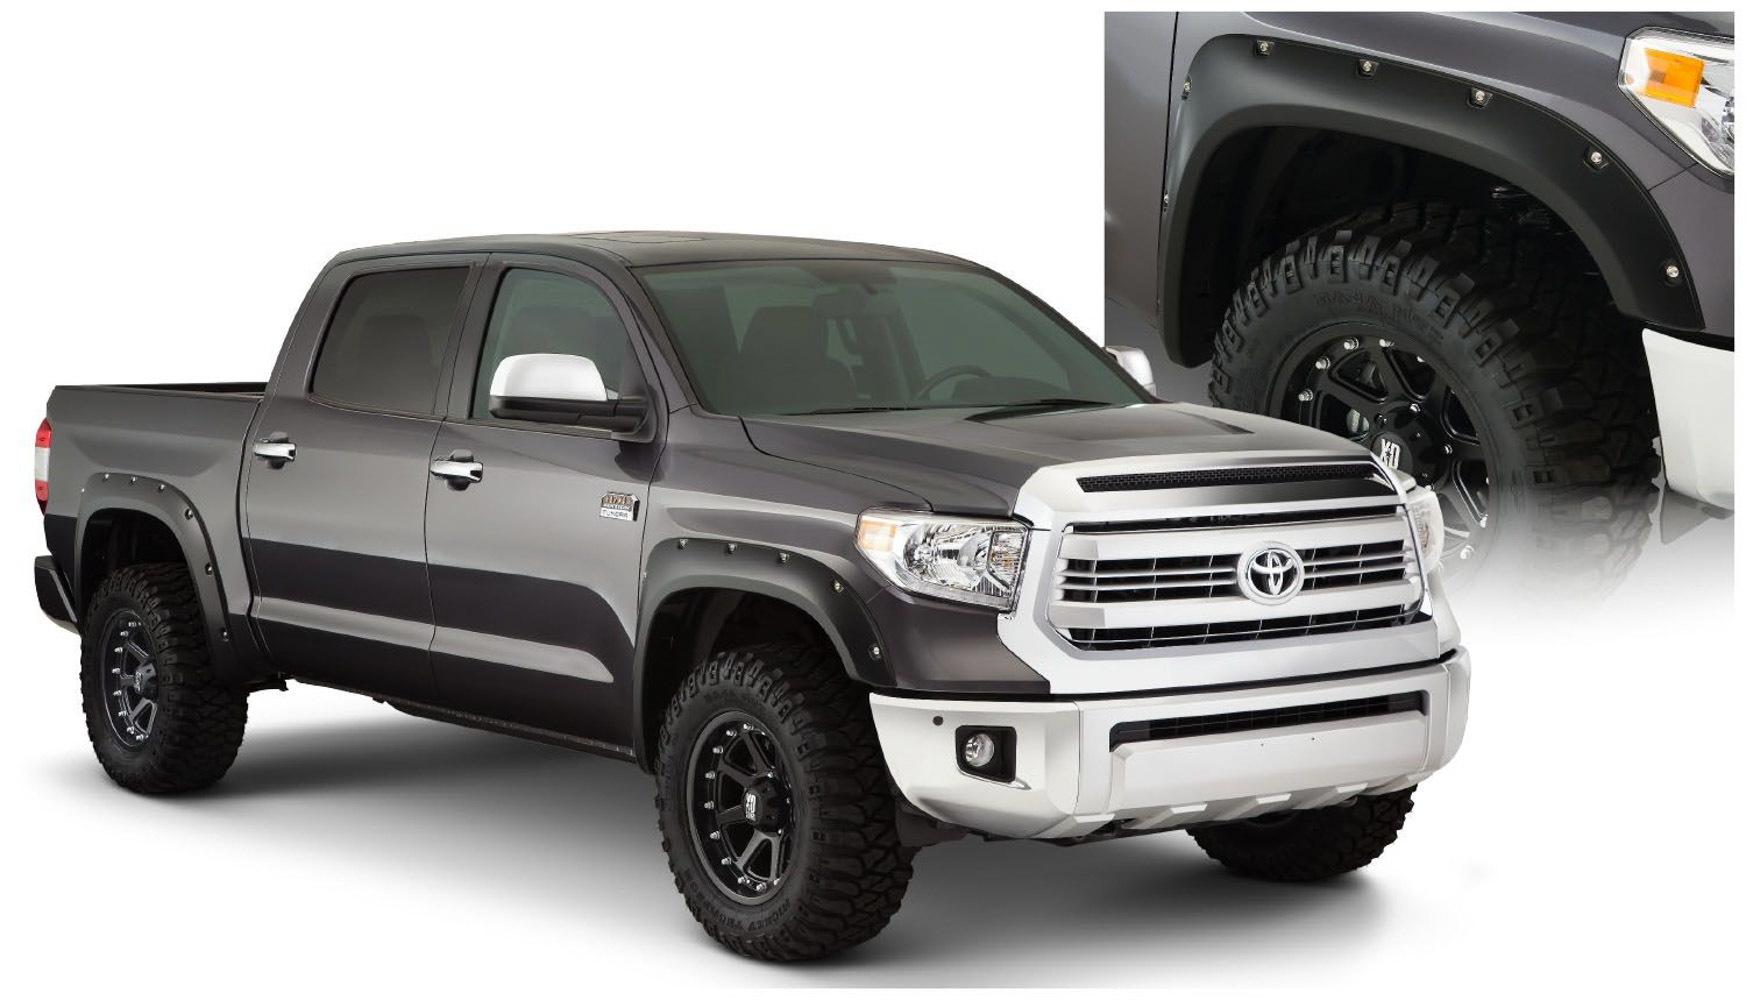 Bushwacker 14-   Toyota Tundra Pock et Style Fender Flares